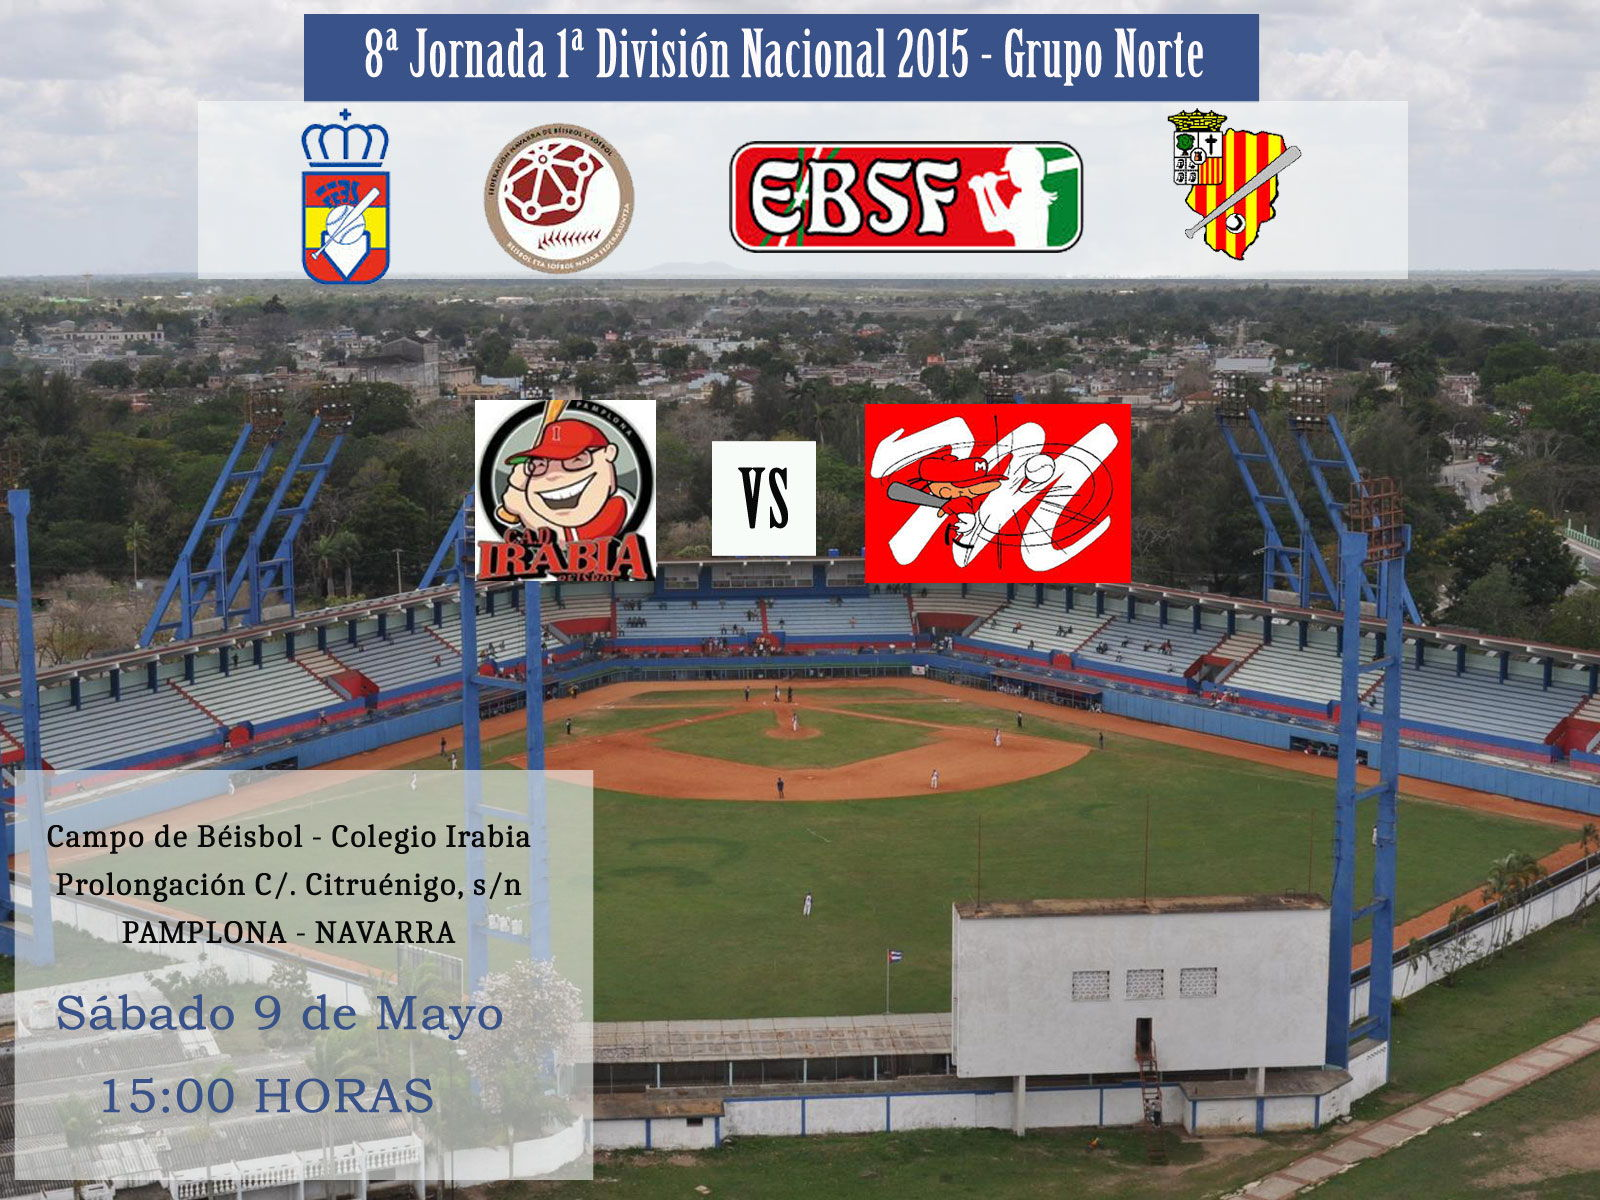 http://www.beisbolmiralbueno.es/wp-content/uploads/2015/05/carteliRABIAVSMIRALBUENO.jpg